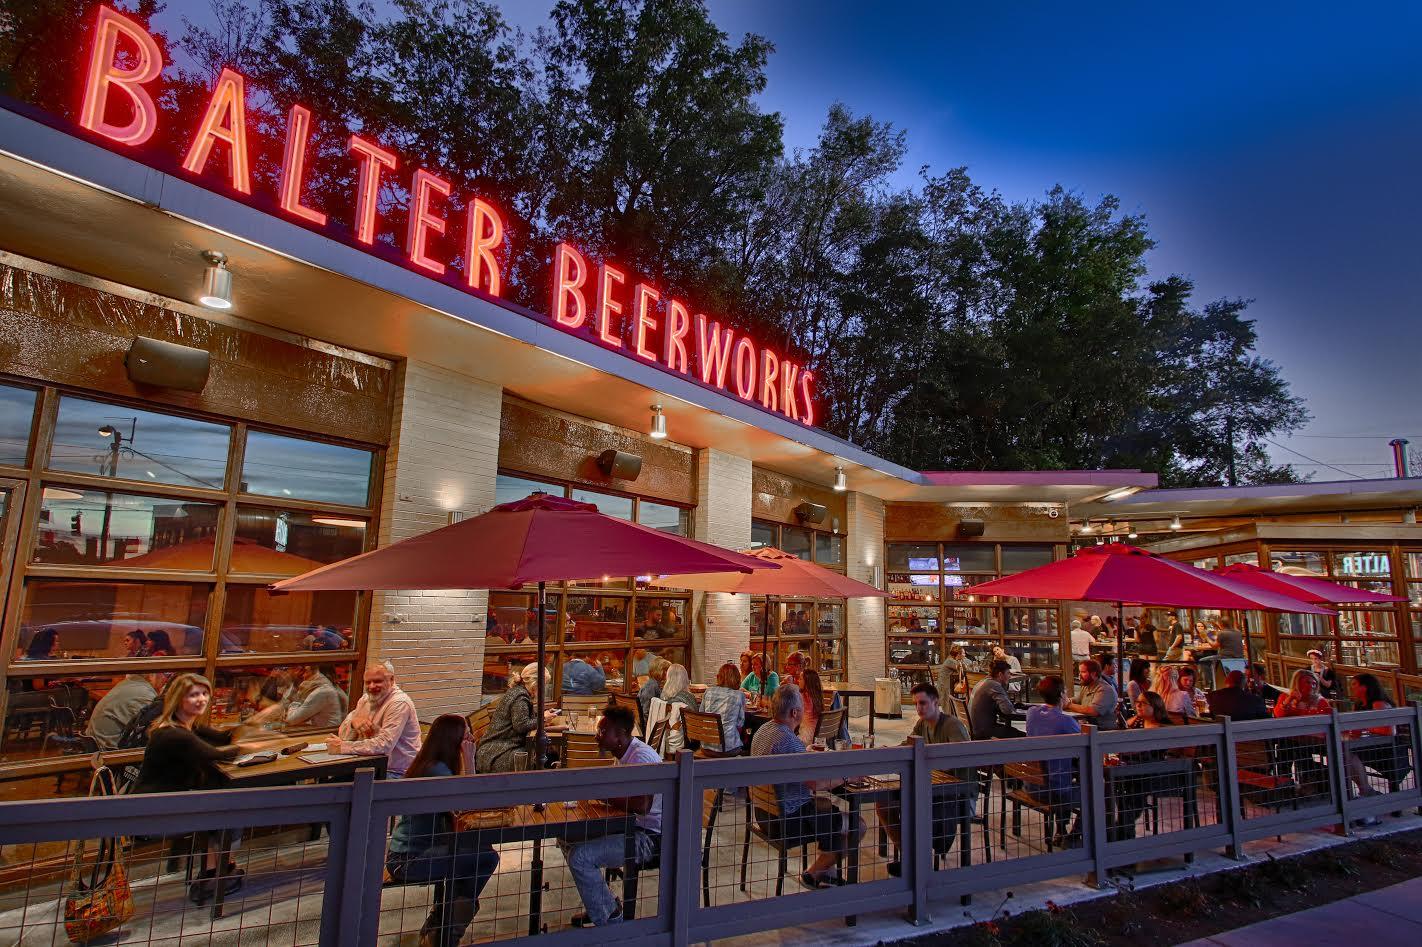 balter beerworks knoxville evolve blog road trip spots